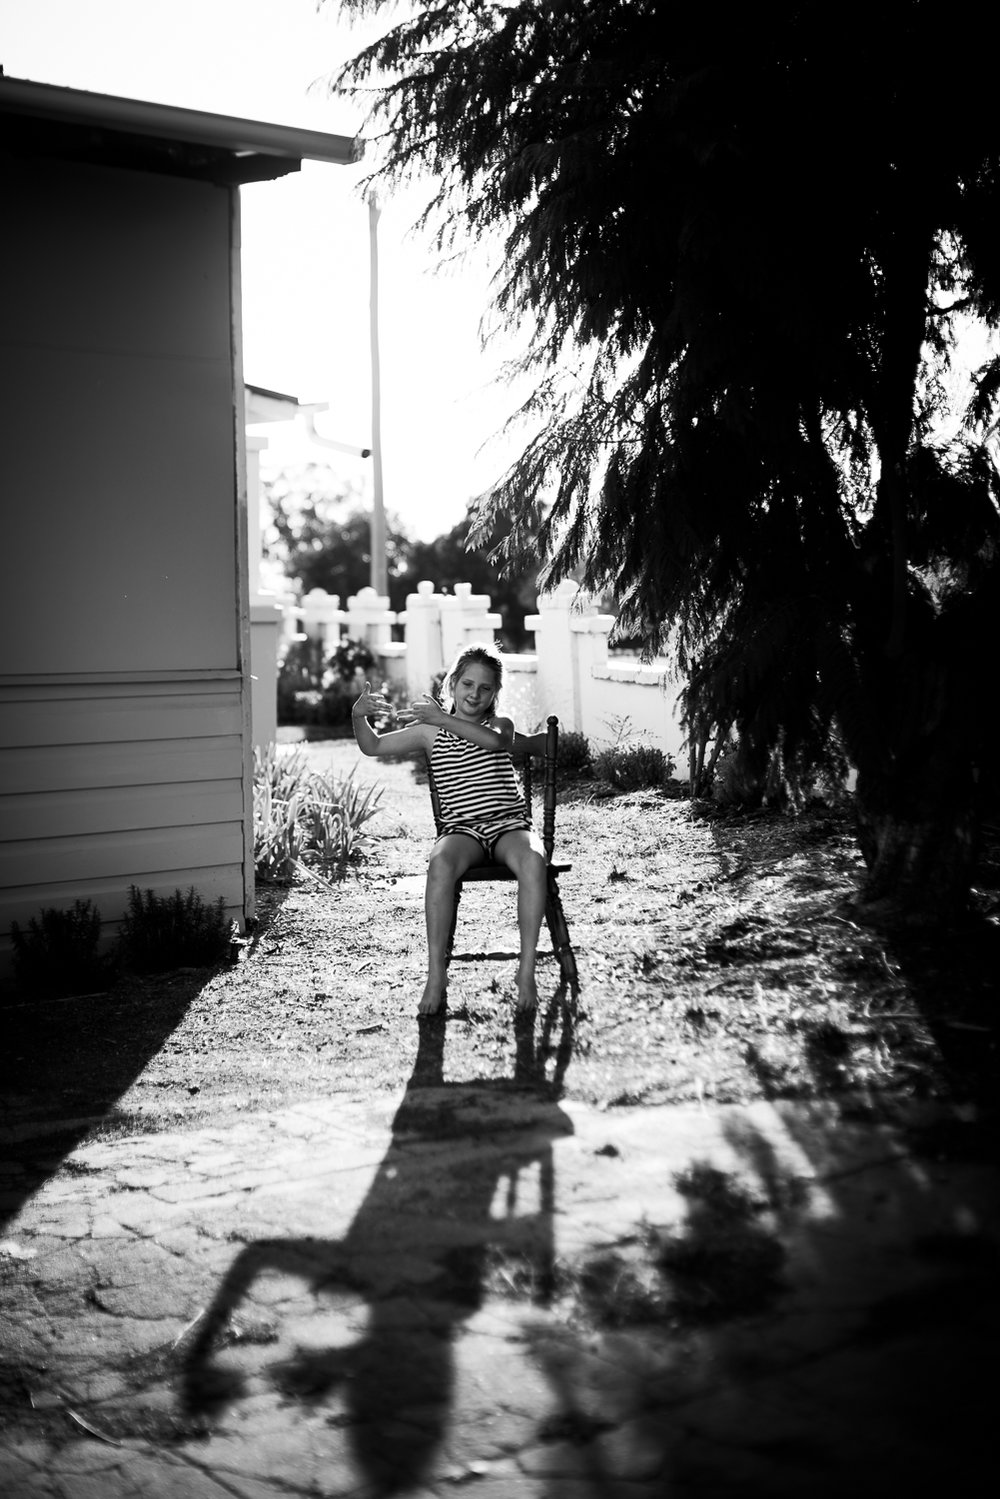 cindycavanagh-sydneyphotographer-longgrass (38 of 47).JPG